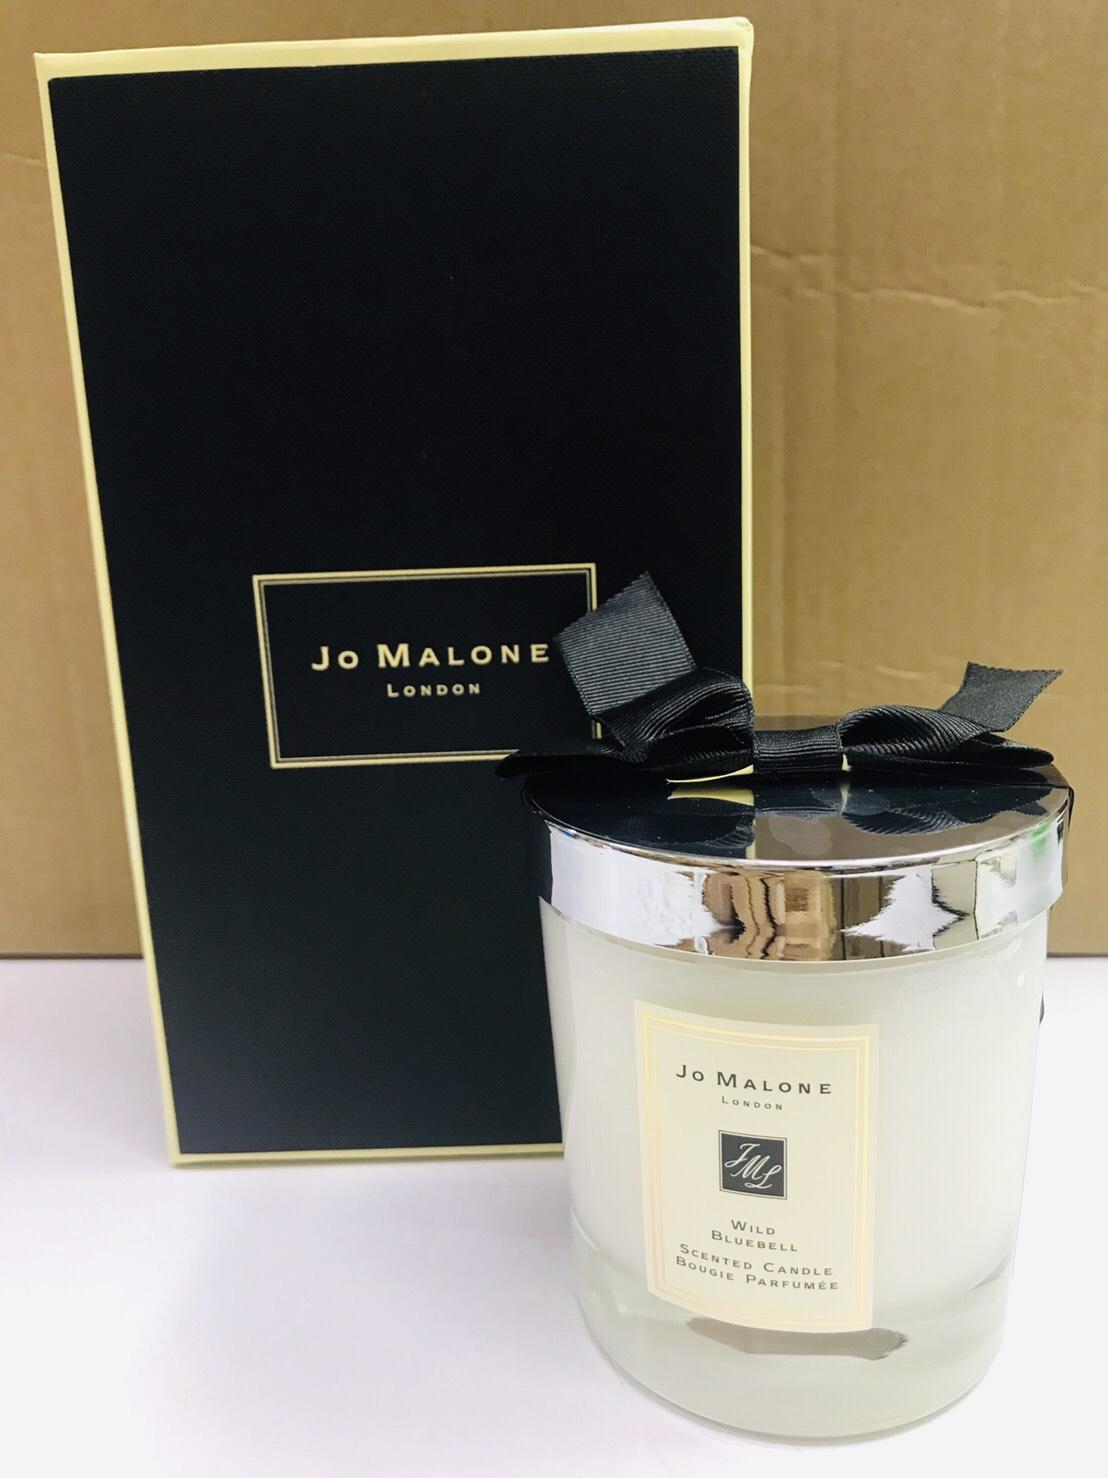 JO MALONE LONDON Wild Bluebell Home Candle 200G. เทียนหอมในโหลแก้วสวยเรียบหรู (มีถุงแถม)